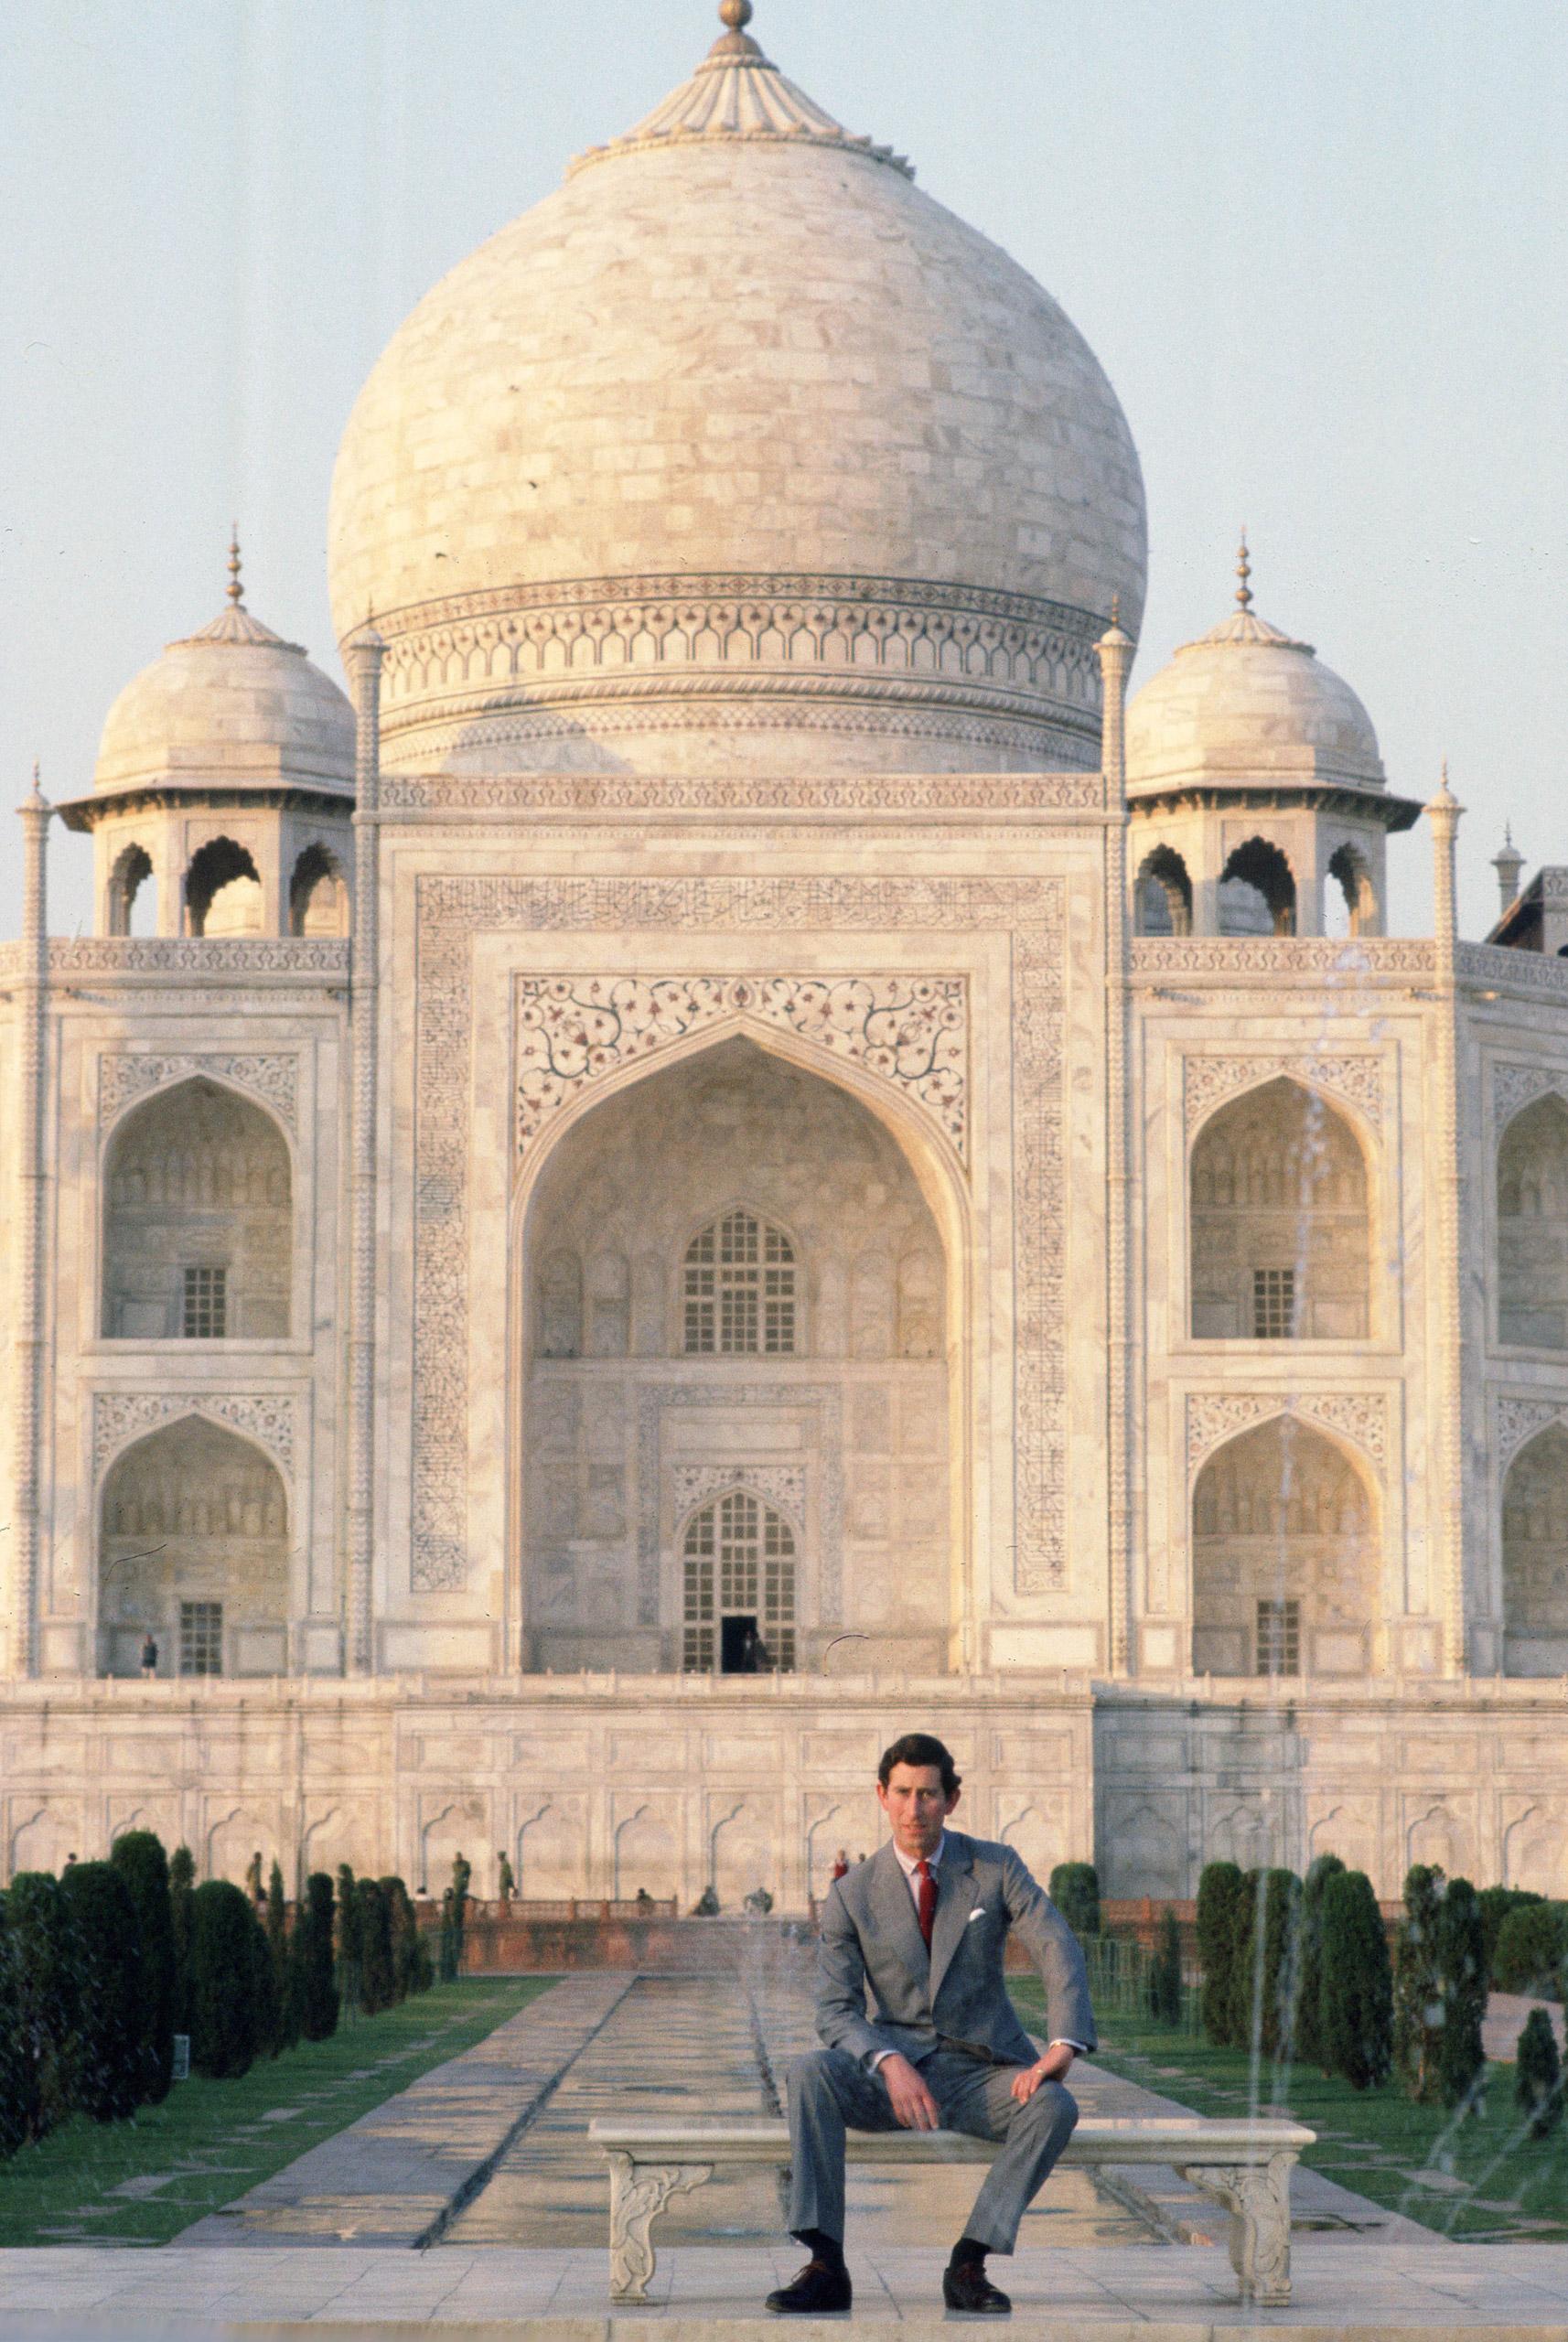 Prince Charles, Prince of Wales visits the Taj Mahal in India, Nov. 28, 1980.